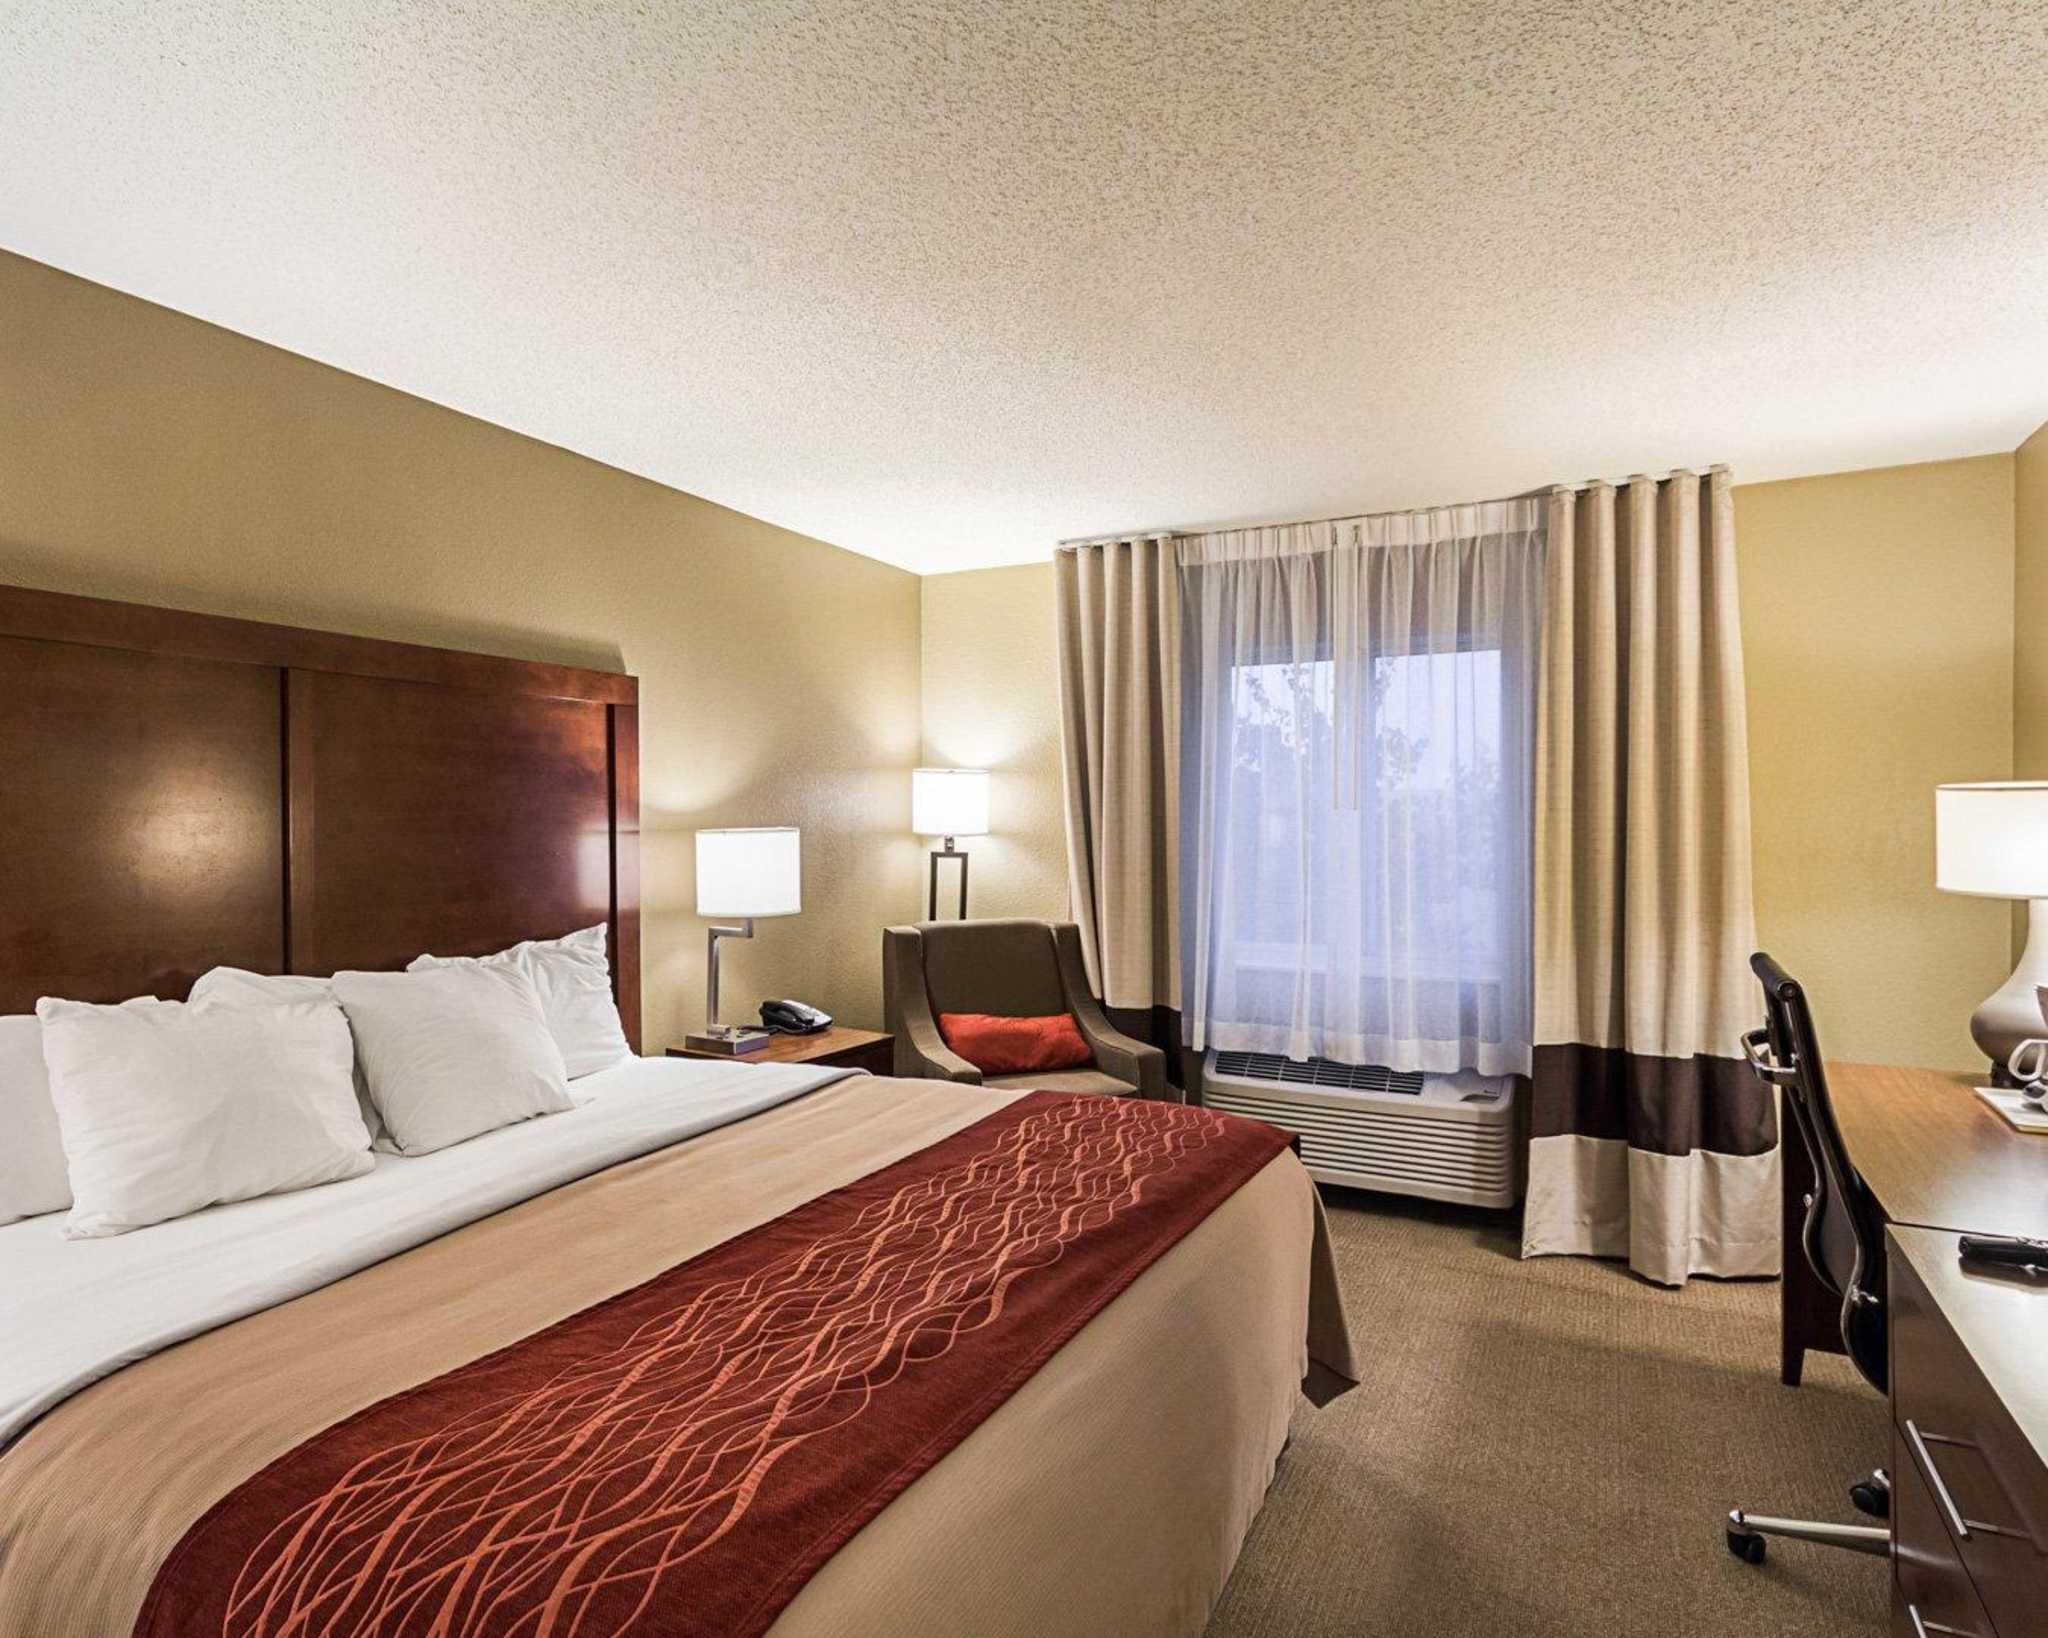 Comfort Inn East image 3